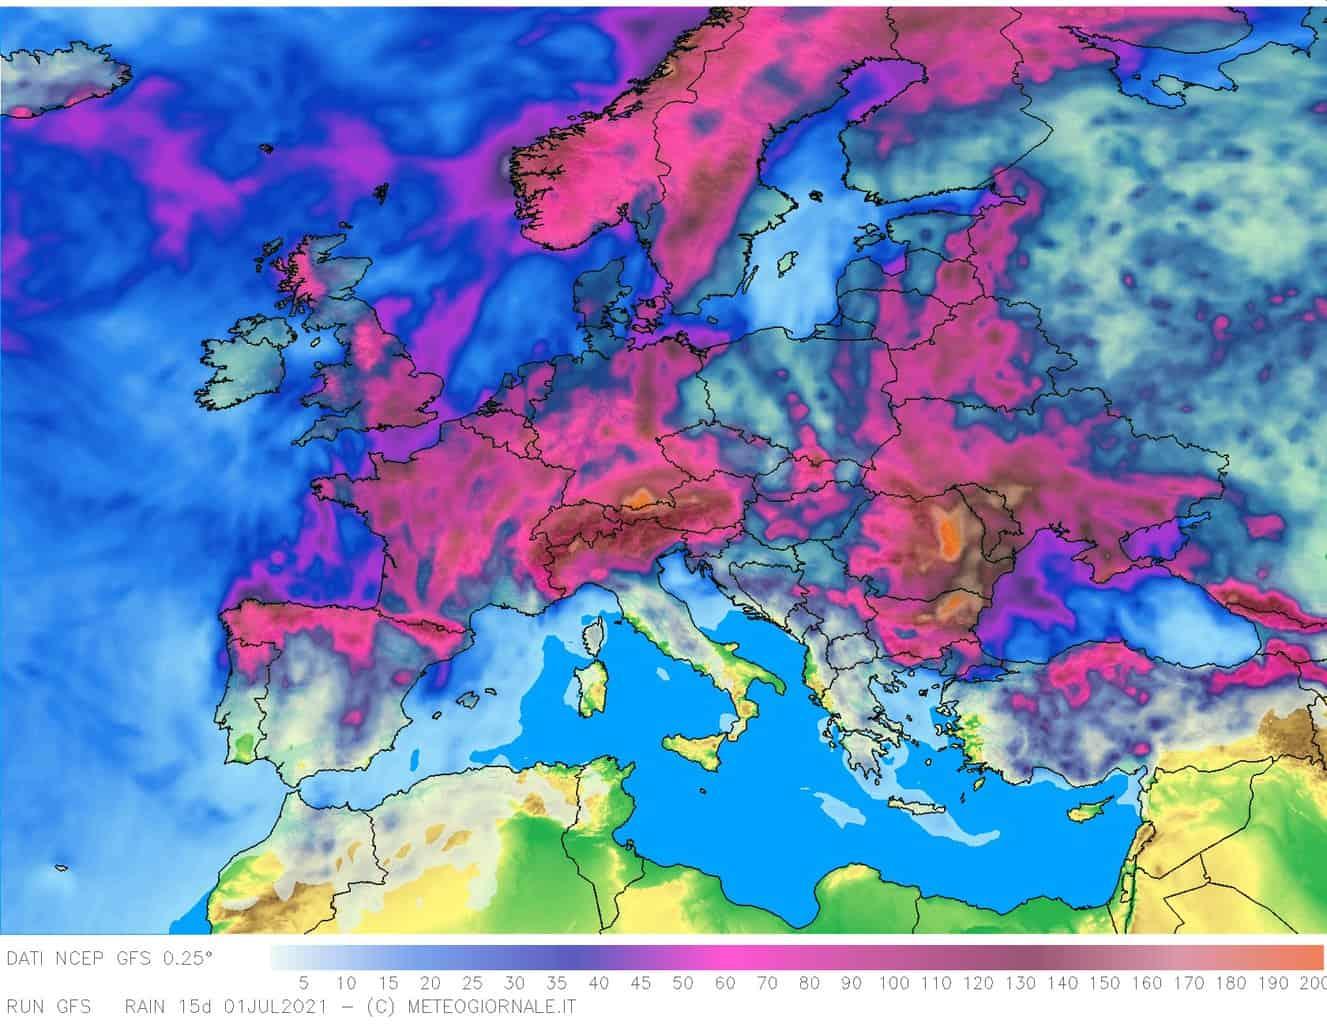 pcp og15d 384 - Meteo europeo e Italia: CALDO d'Africa e l'attivazione di TEMPORALI intensi